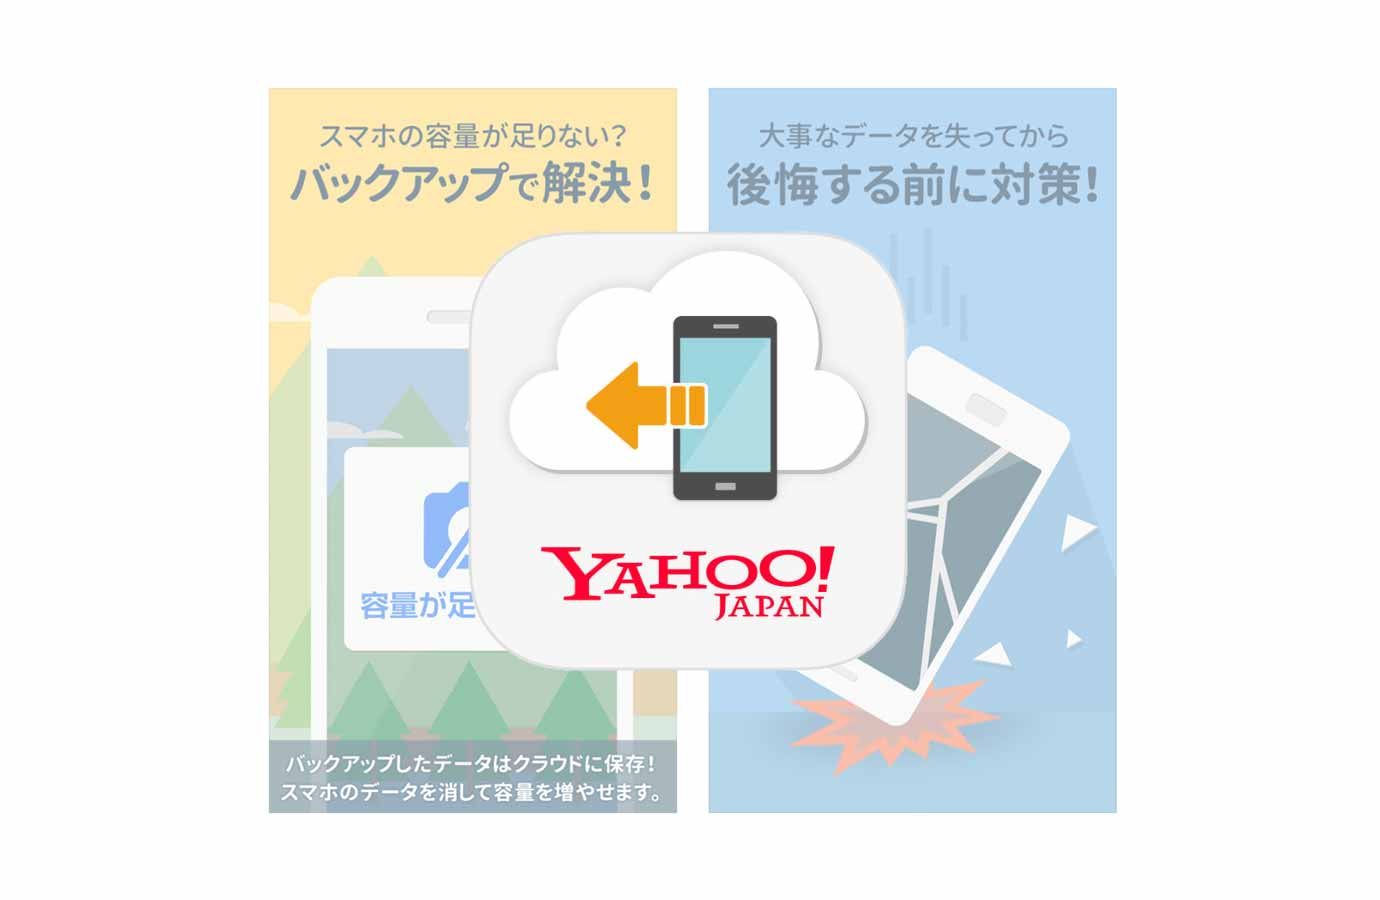 Yahoo Japan、iOS 11で導入されたHEIF、HEVCに対応した「Yahoo!かんたんバックアップ 2.0.16」リリース